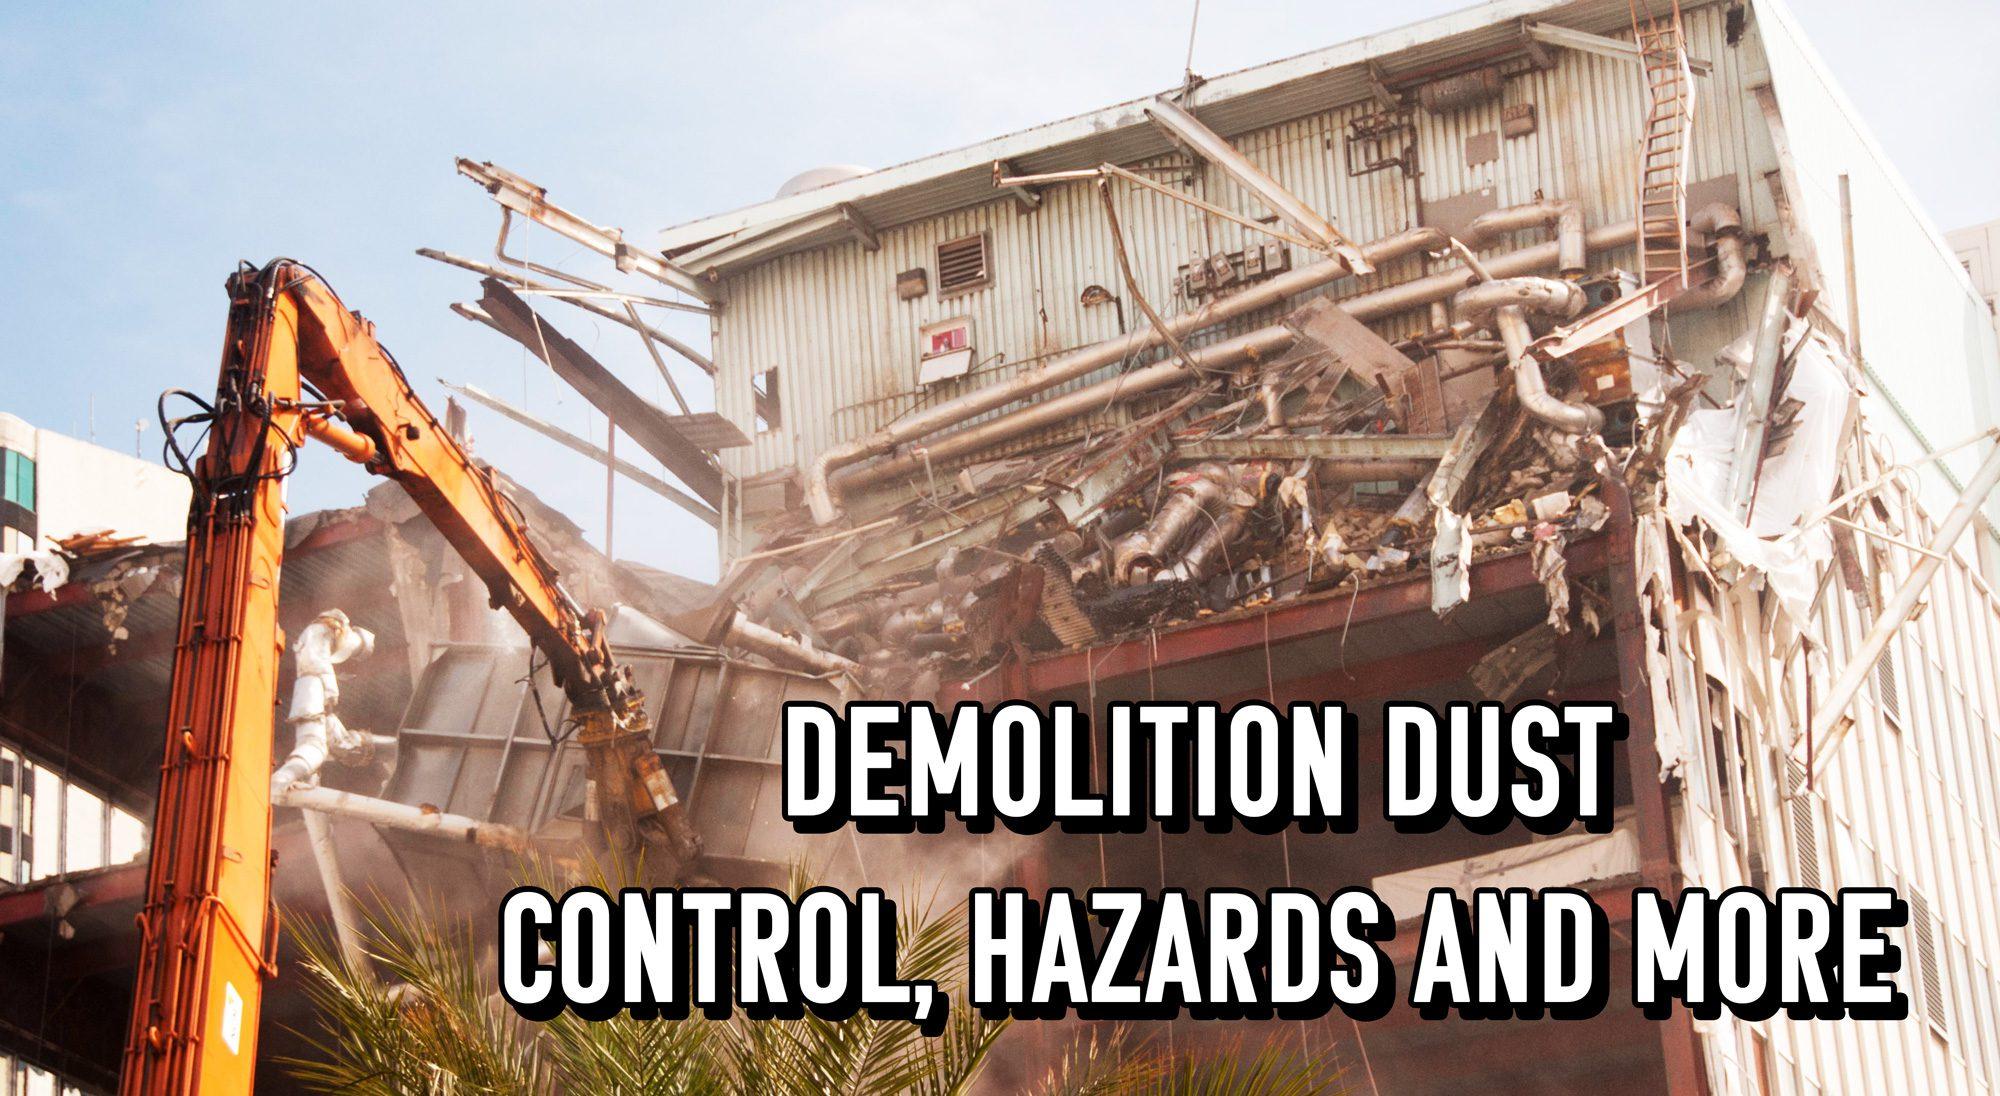 demolition-dust-control-hazards-and-more